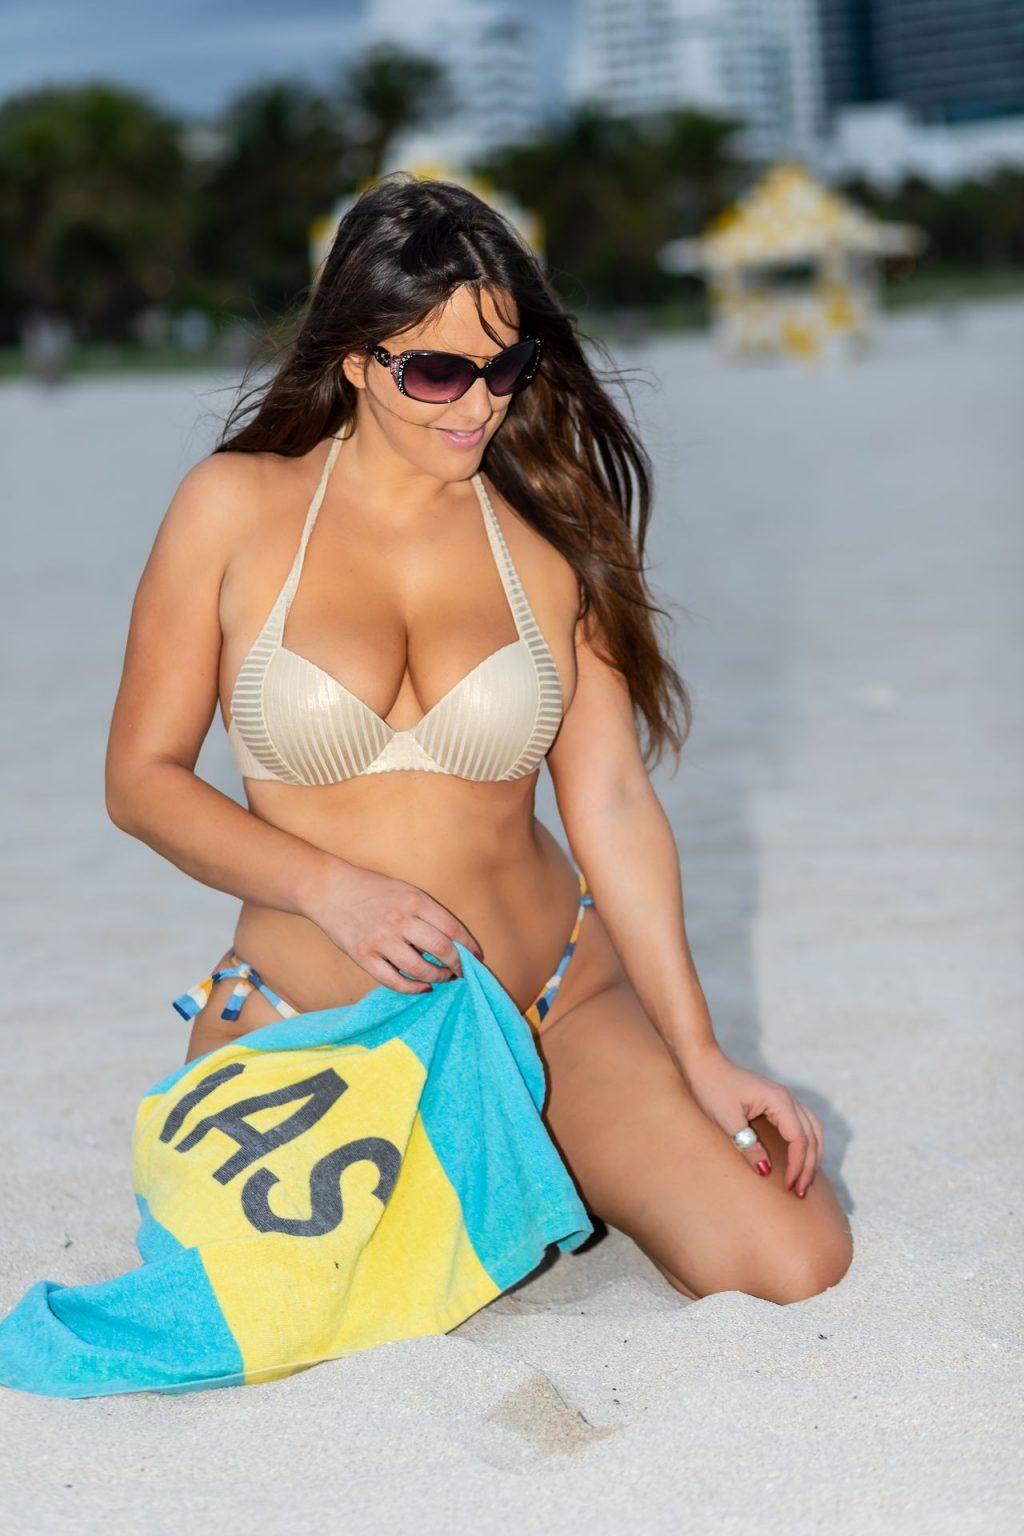 Claudia Romani Poses on the Beach in Miami (20 Photos)